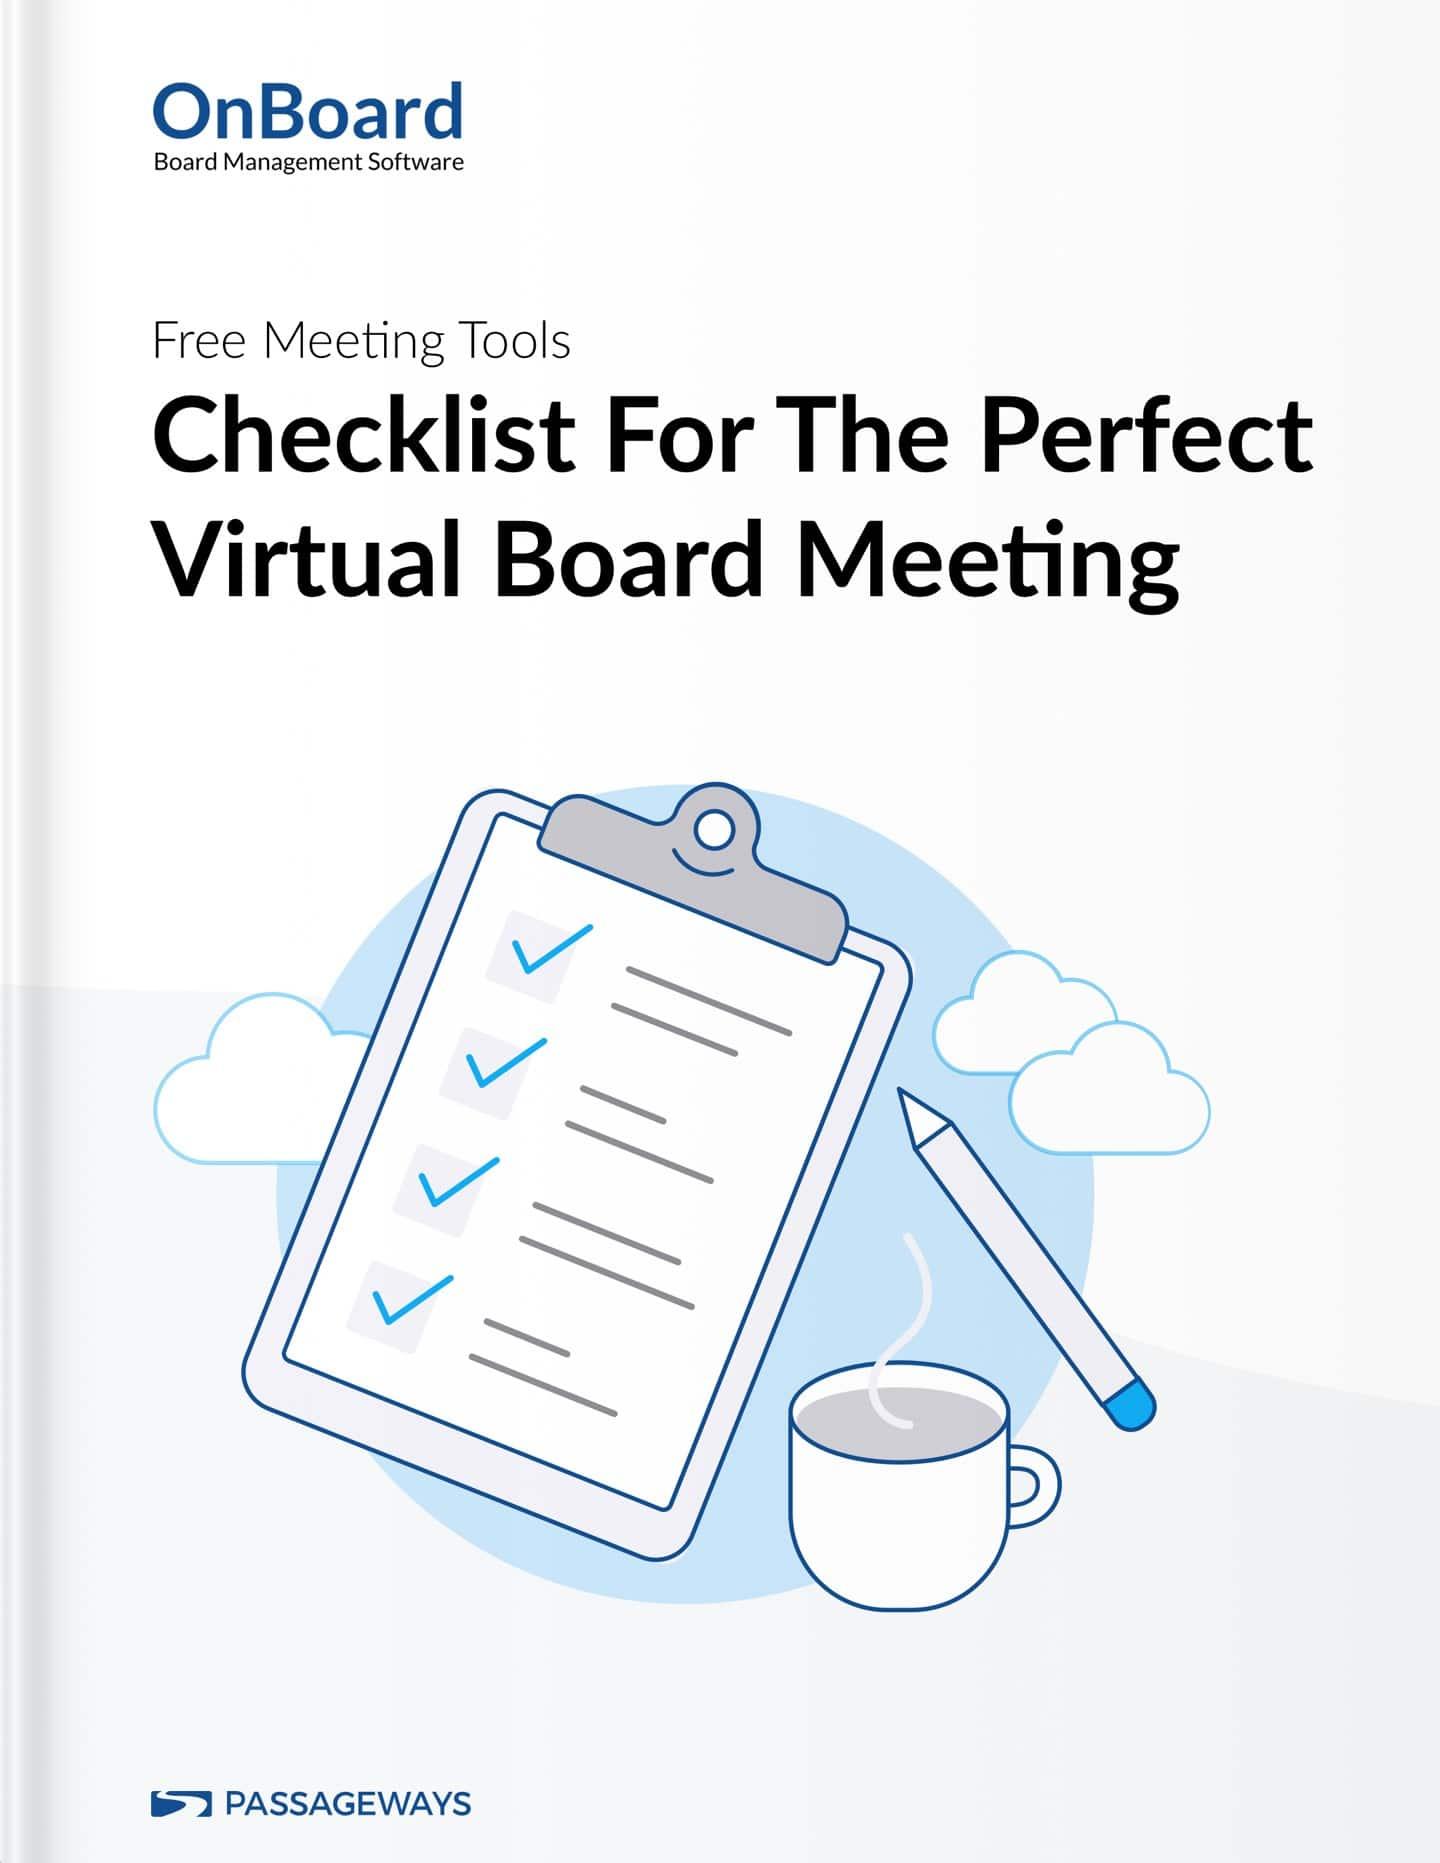 Checklist for Virtual Board Meetings